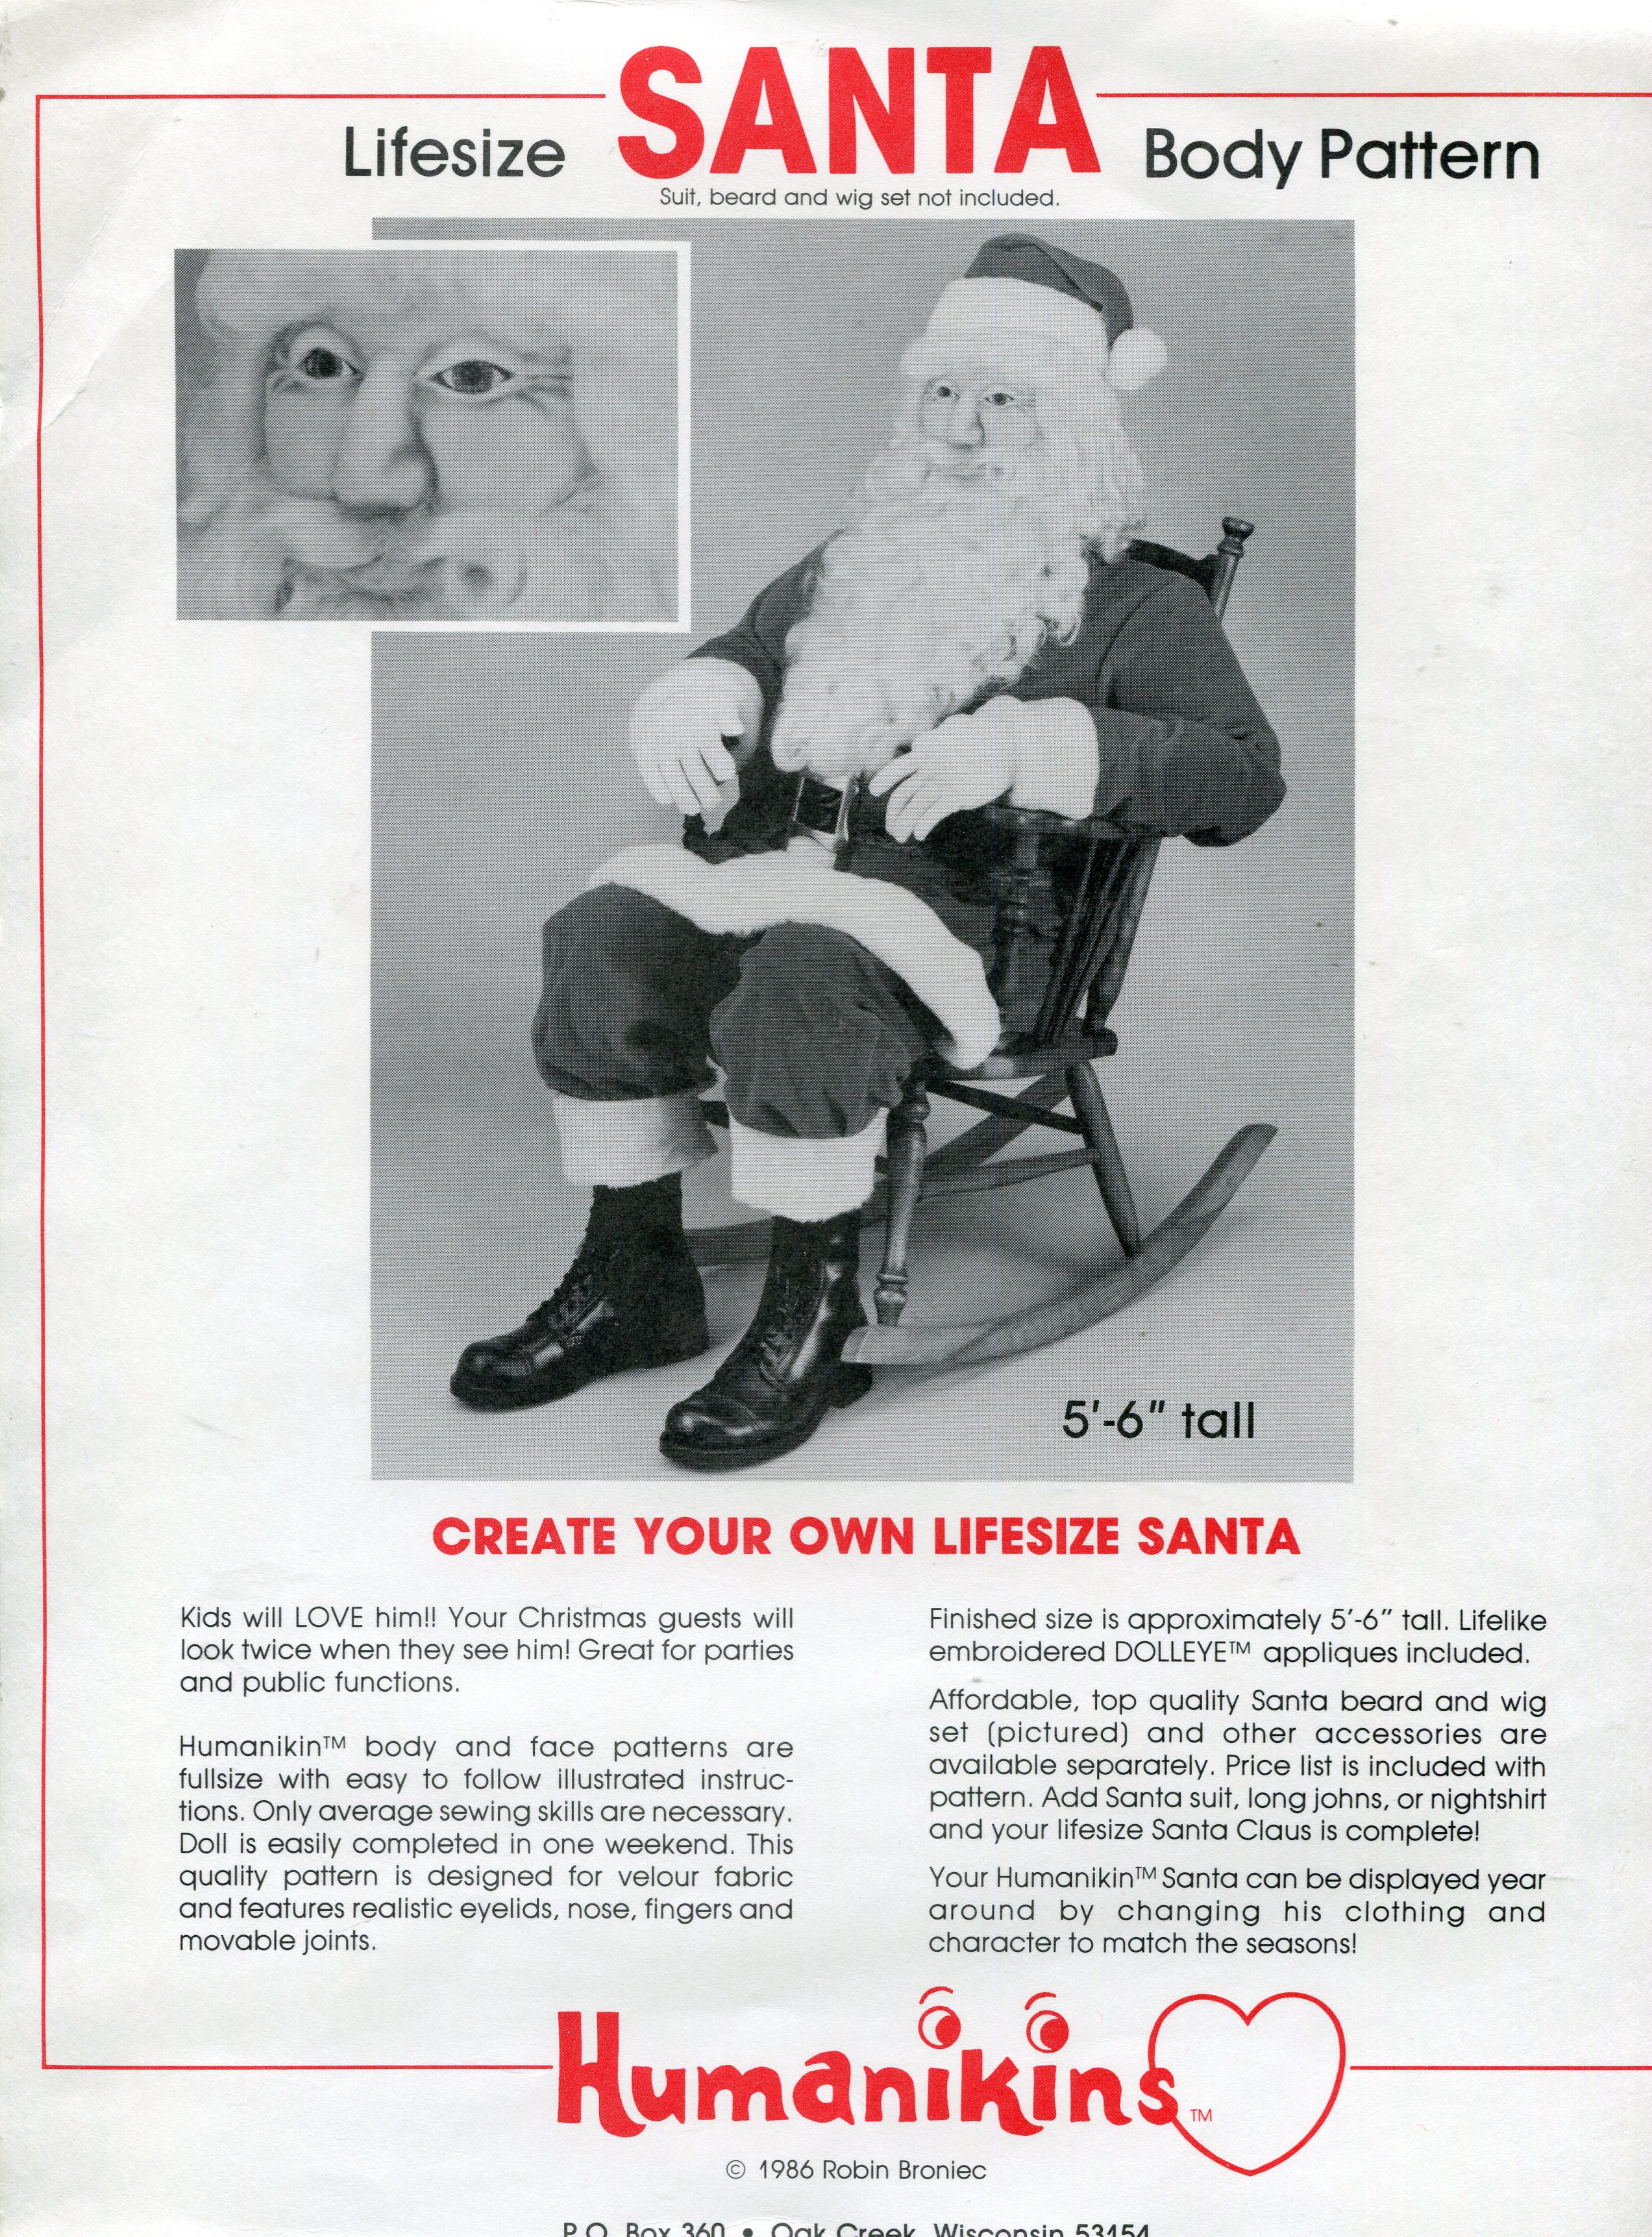 Humanikins Santa Body